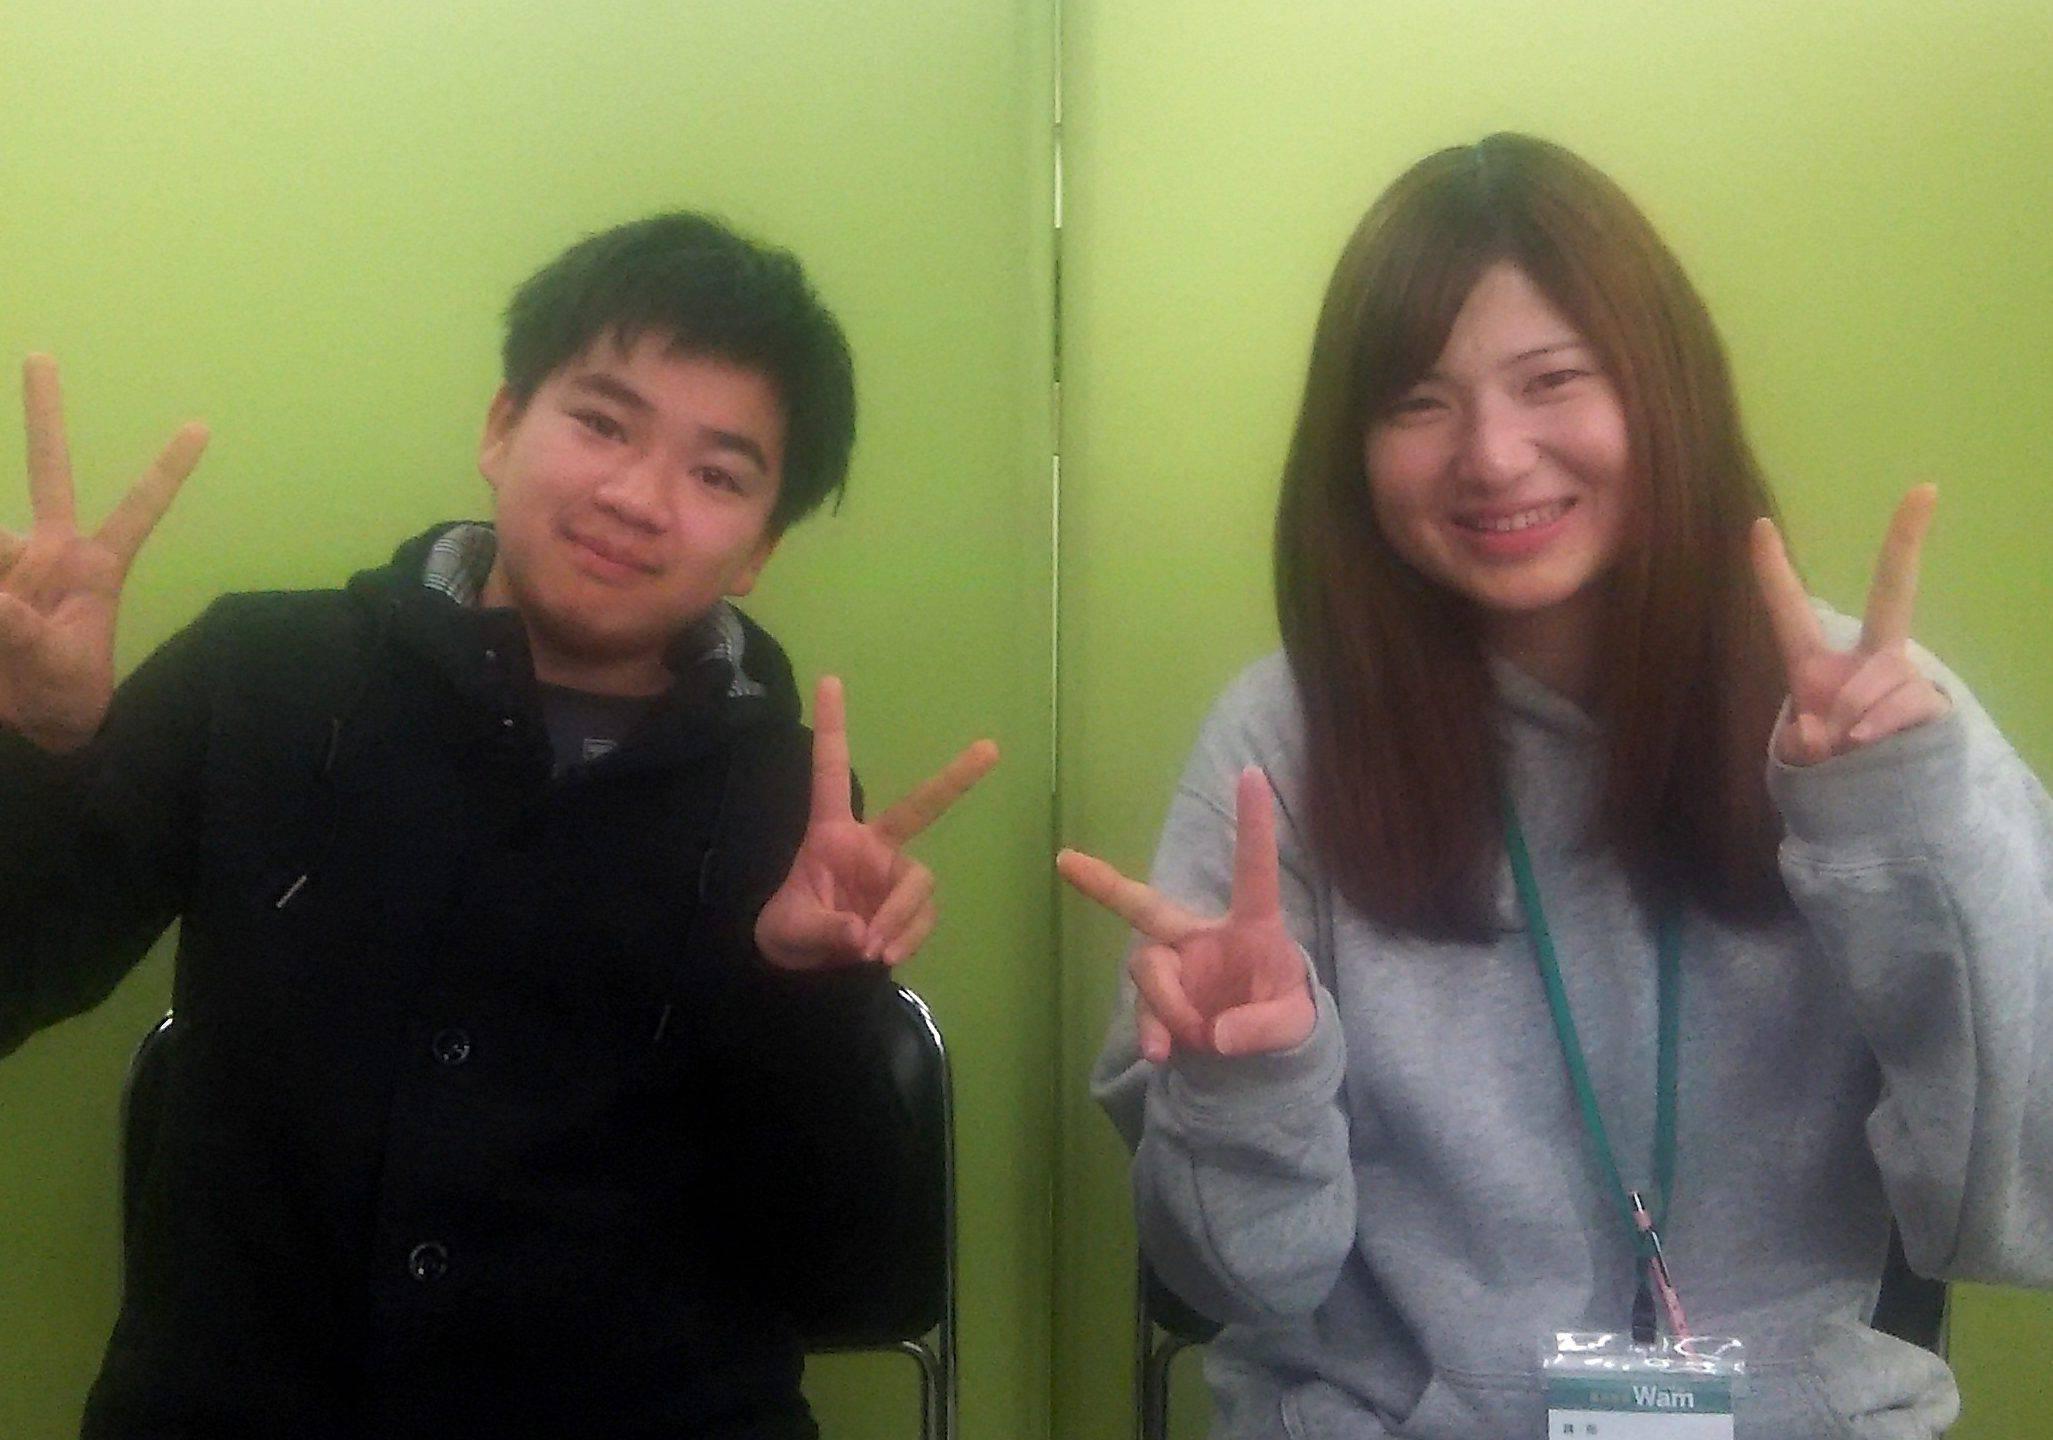 H29春 中学3年 内山皓斗くん 松谷先生